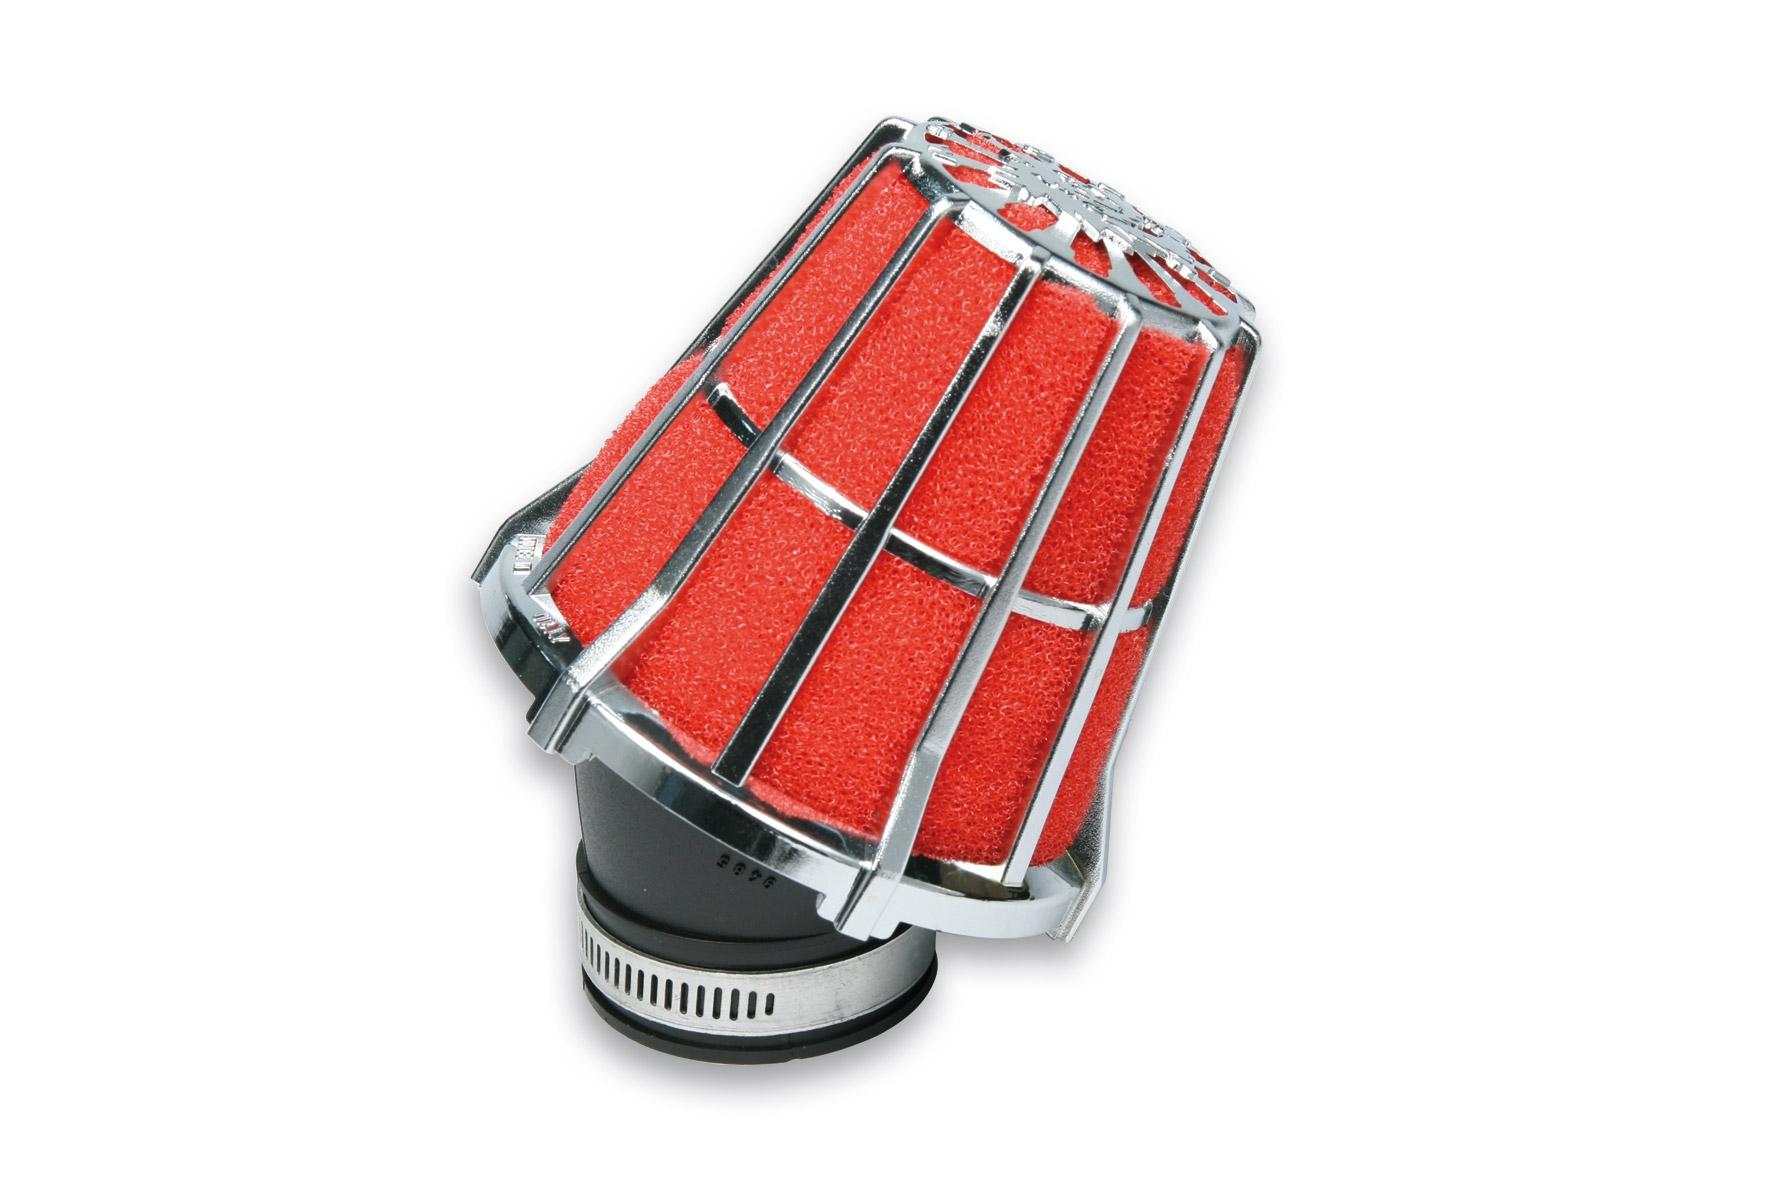 Filtre à air Malossi Red Filter E5 D.41 incliné 30 chromé